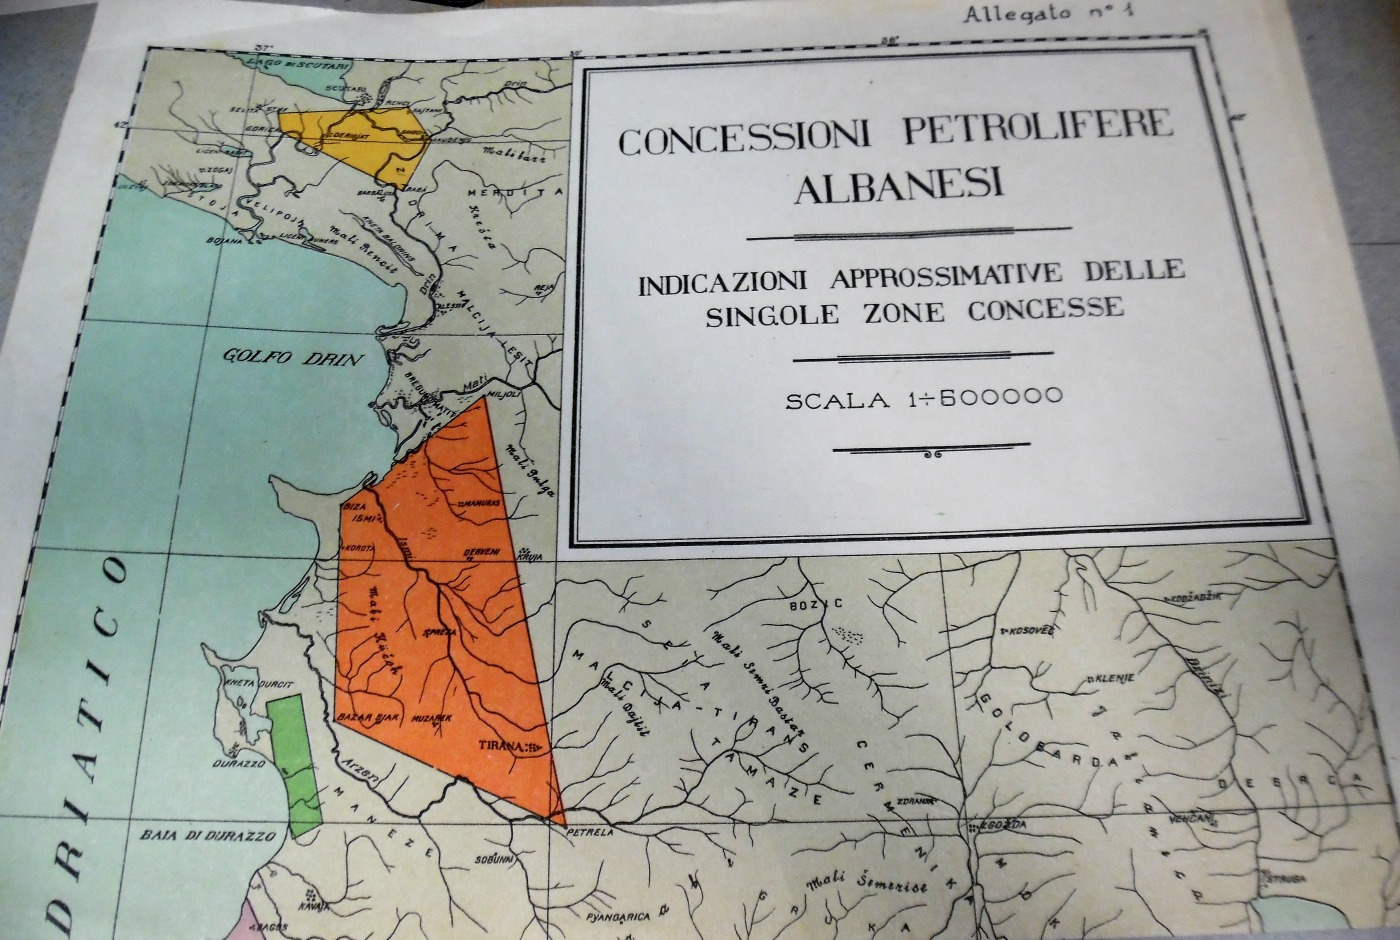 Concessioni Petrolifere Albanesi